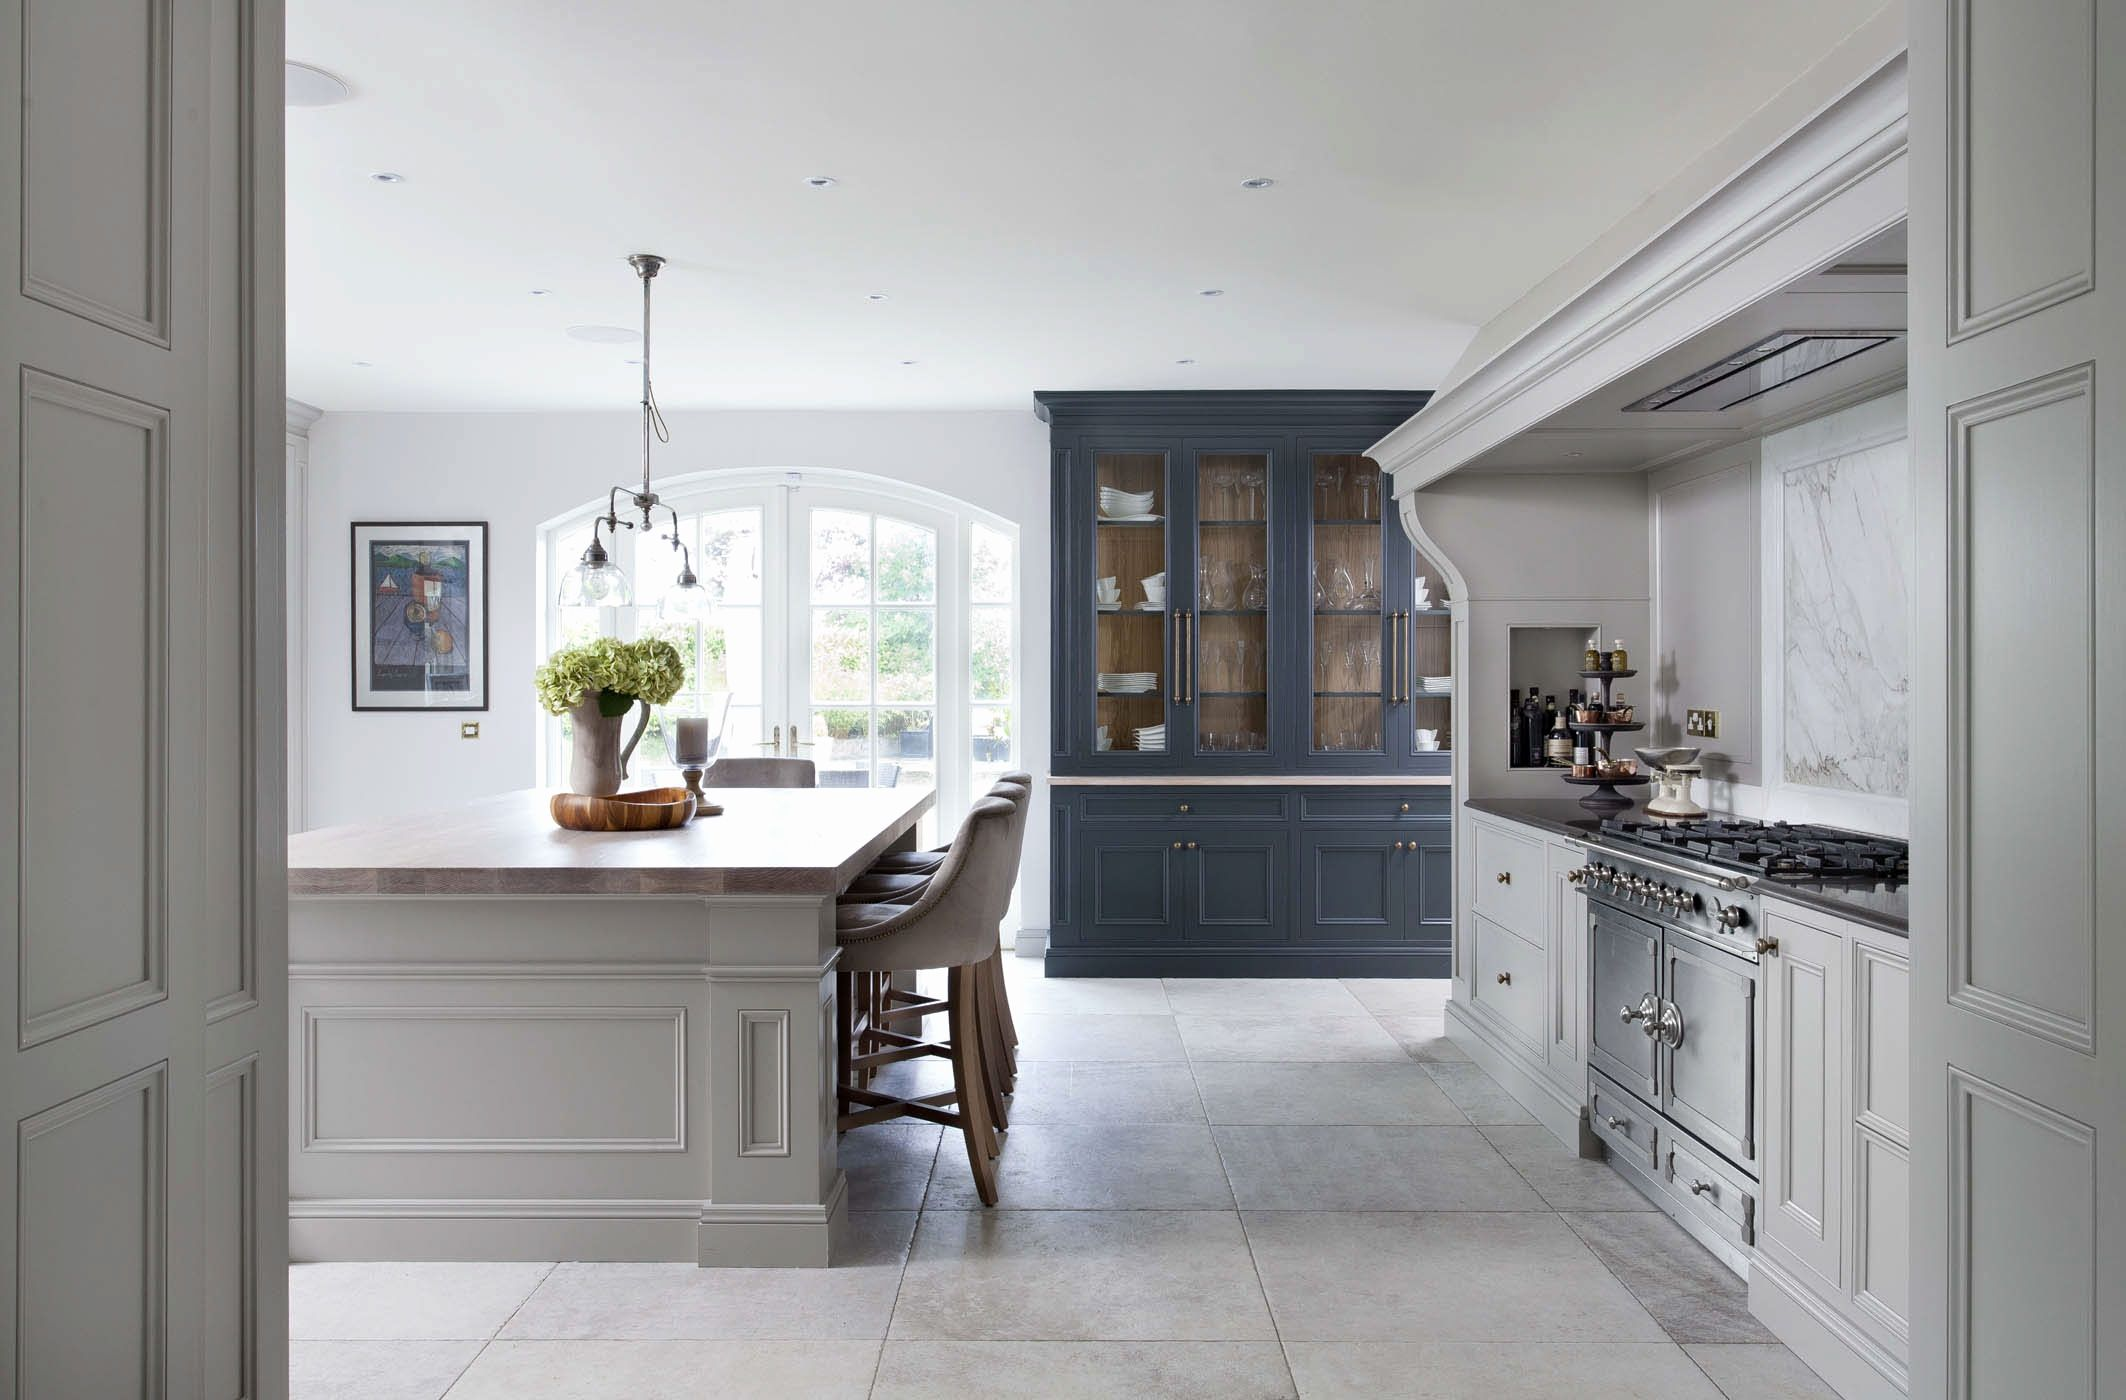 Handmade Bespoke Luxury Kitchens Ireland From Kitchen